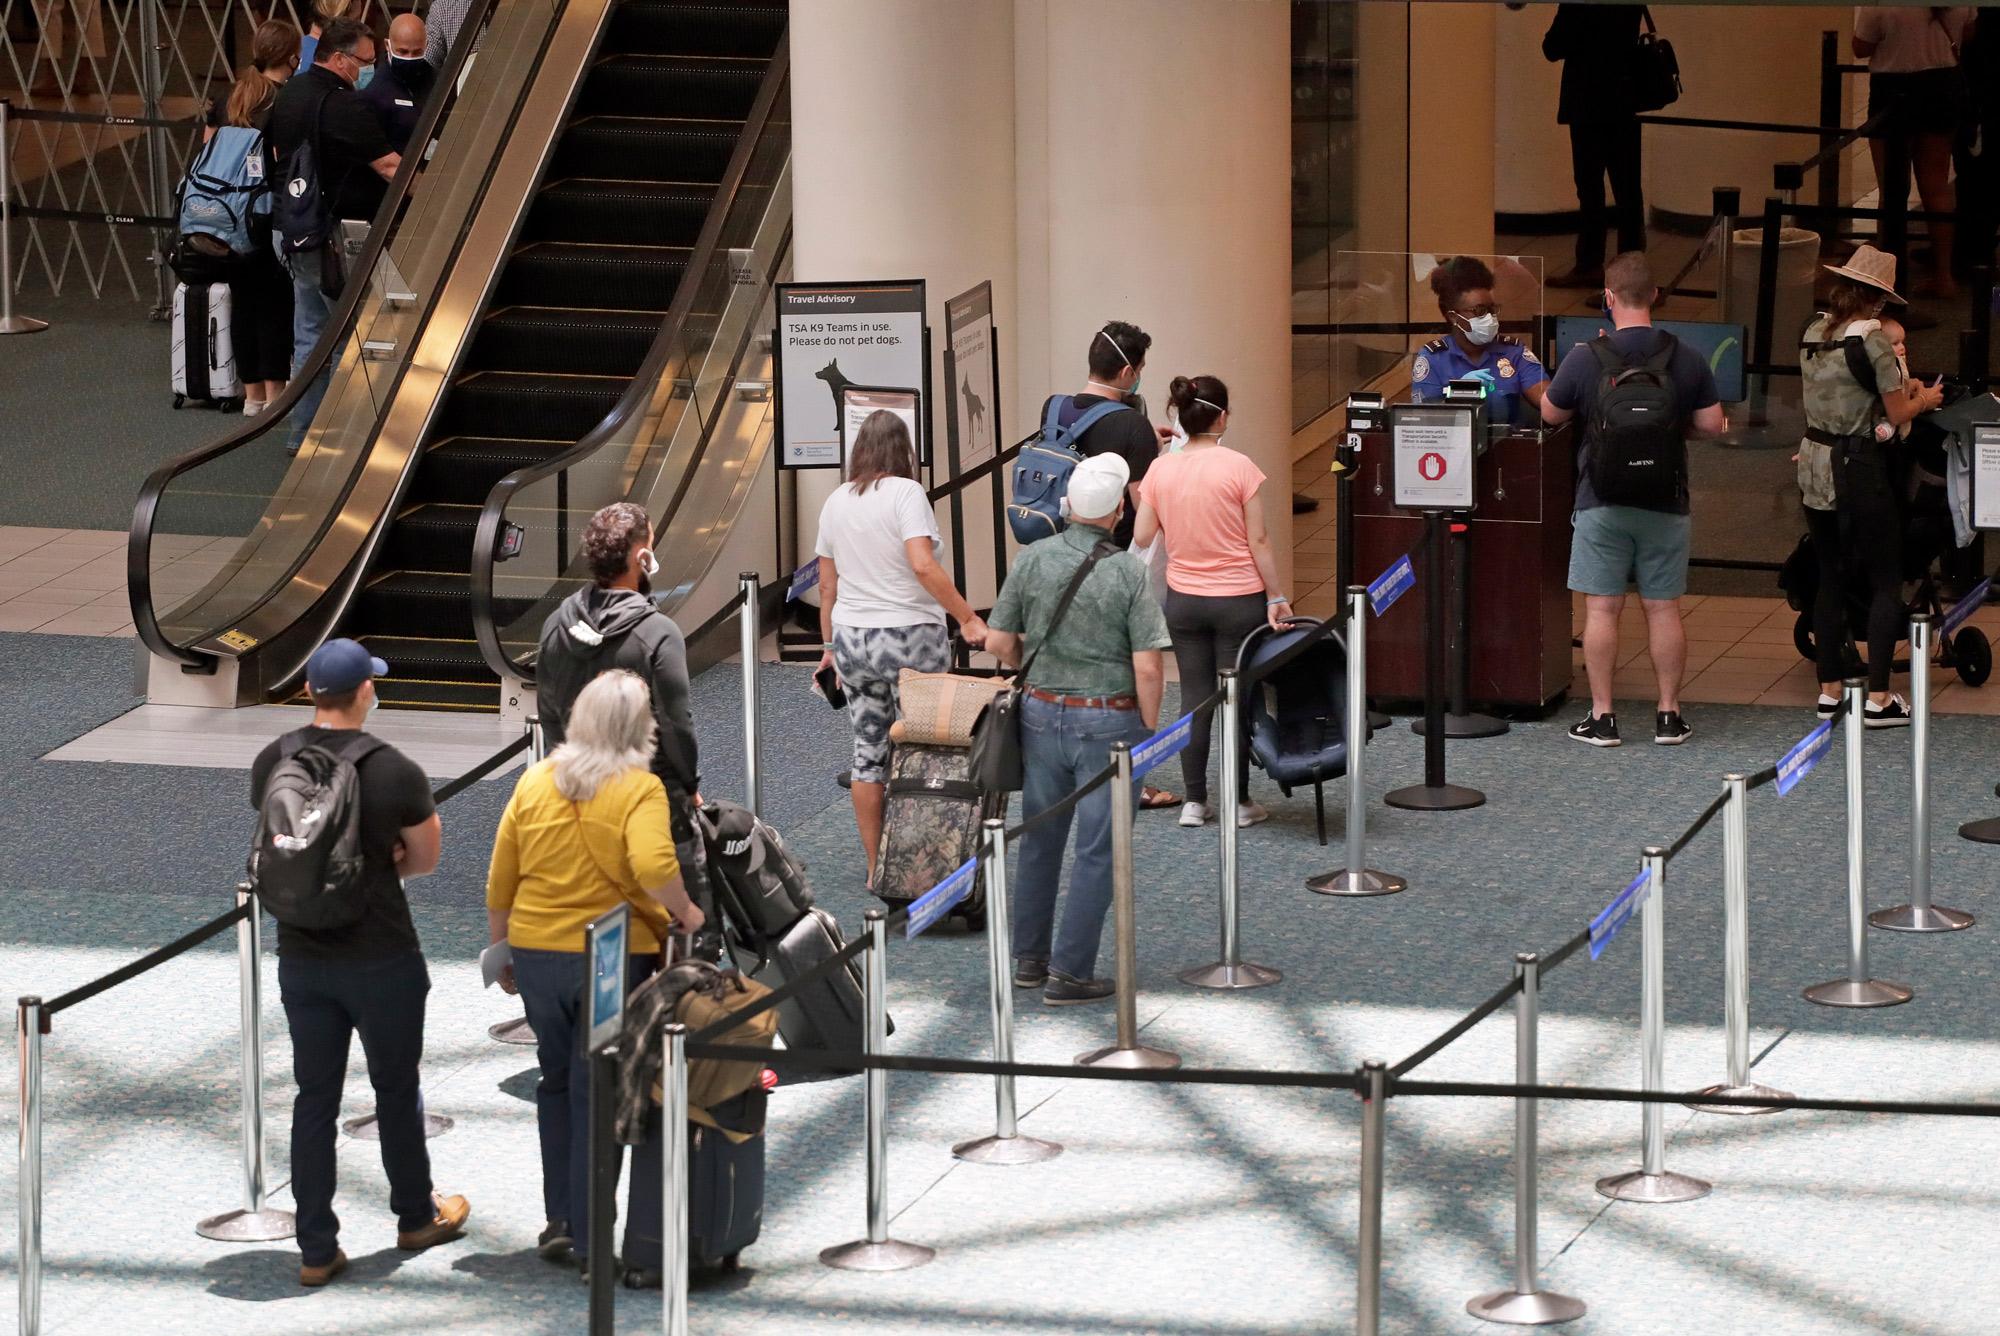 Passengers line up to enter TSA pre-check at Orlando International Airport on June 17 in Orlando.